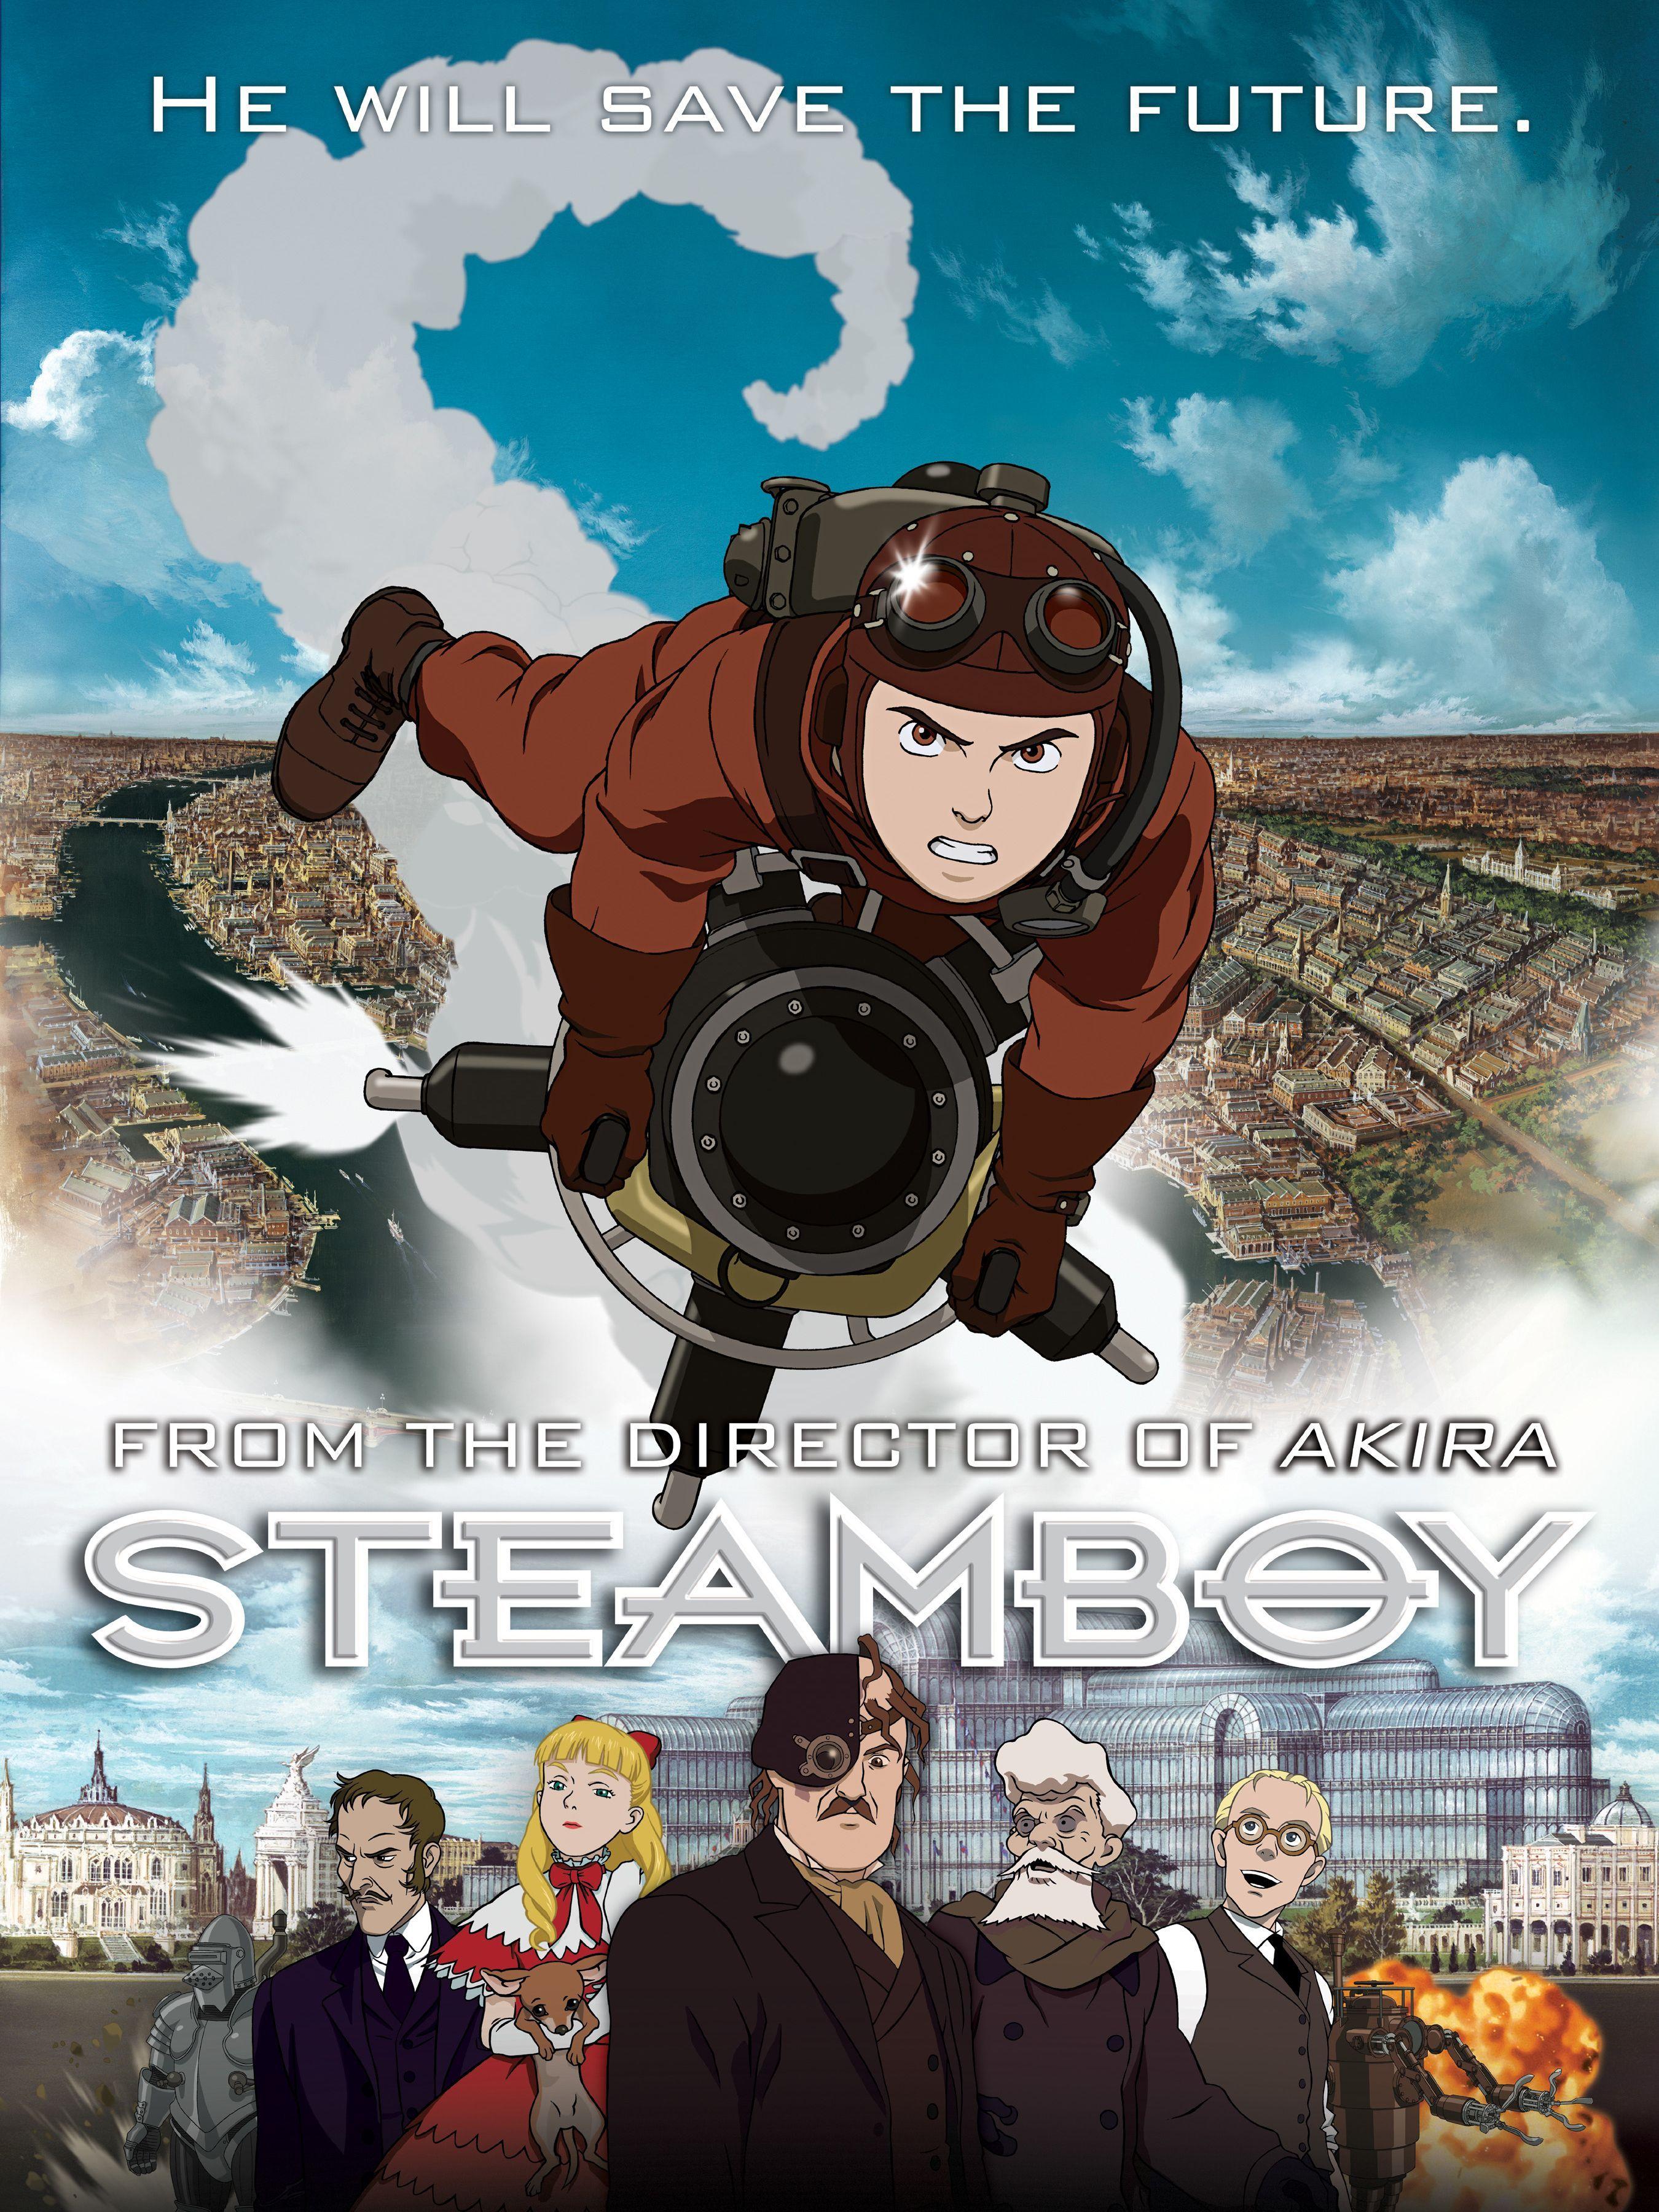 Steamboy Movie Review Steampunk movies, Anime movies